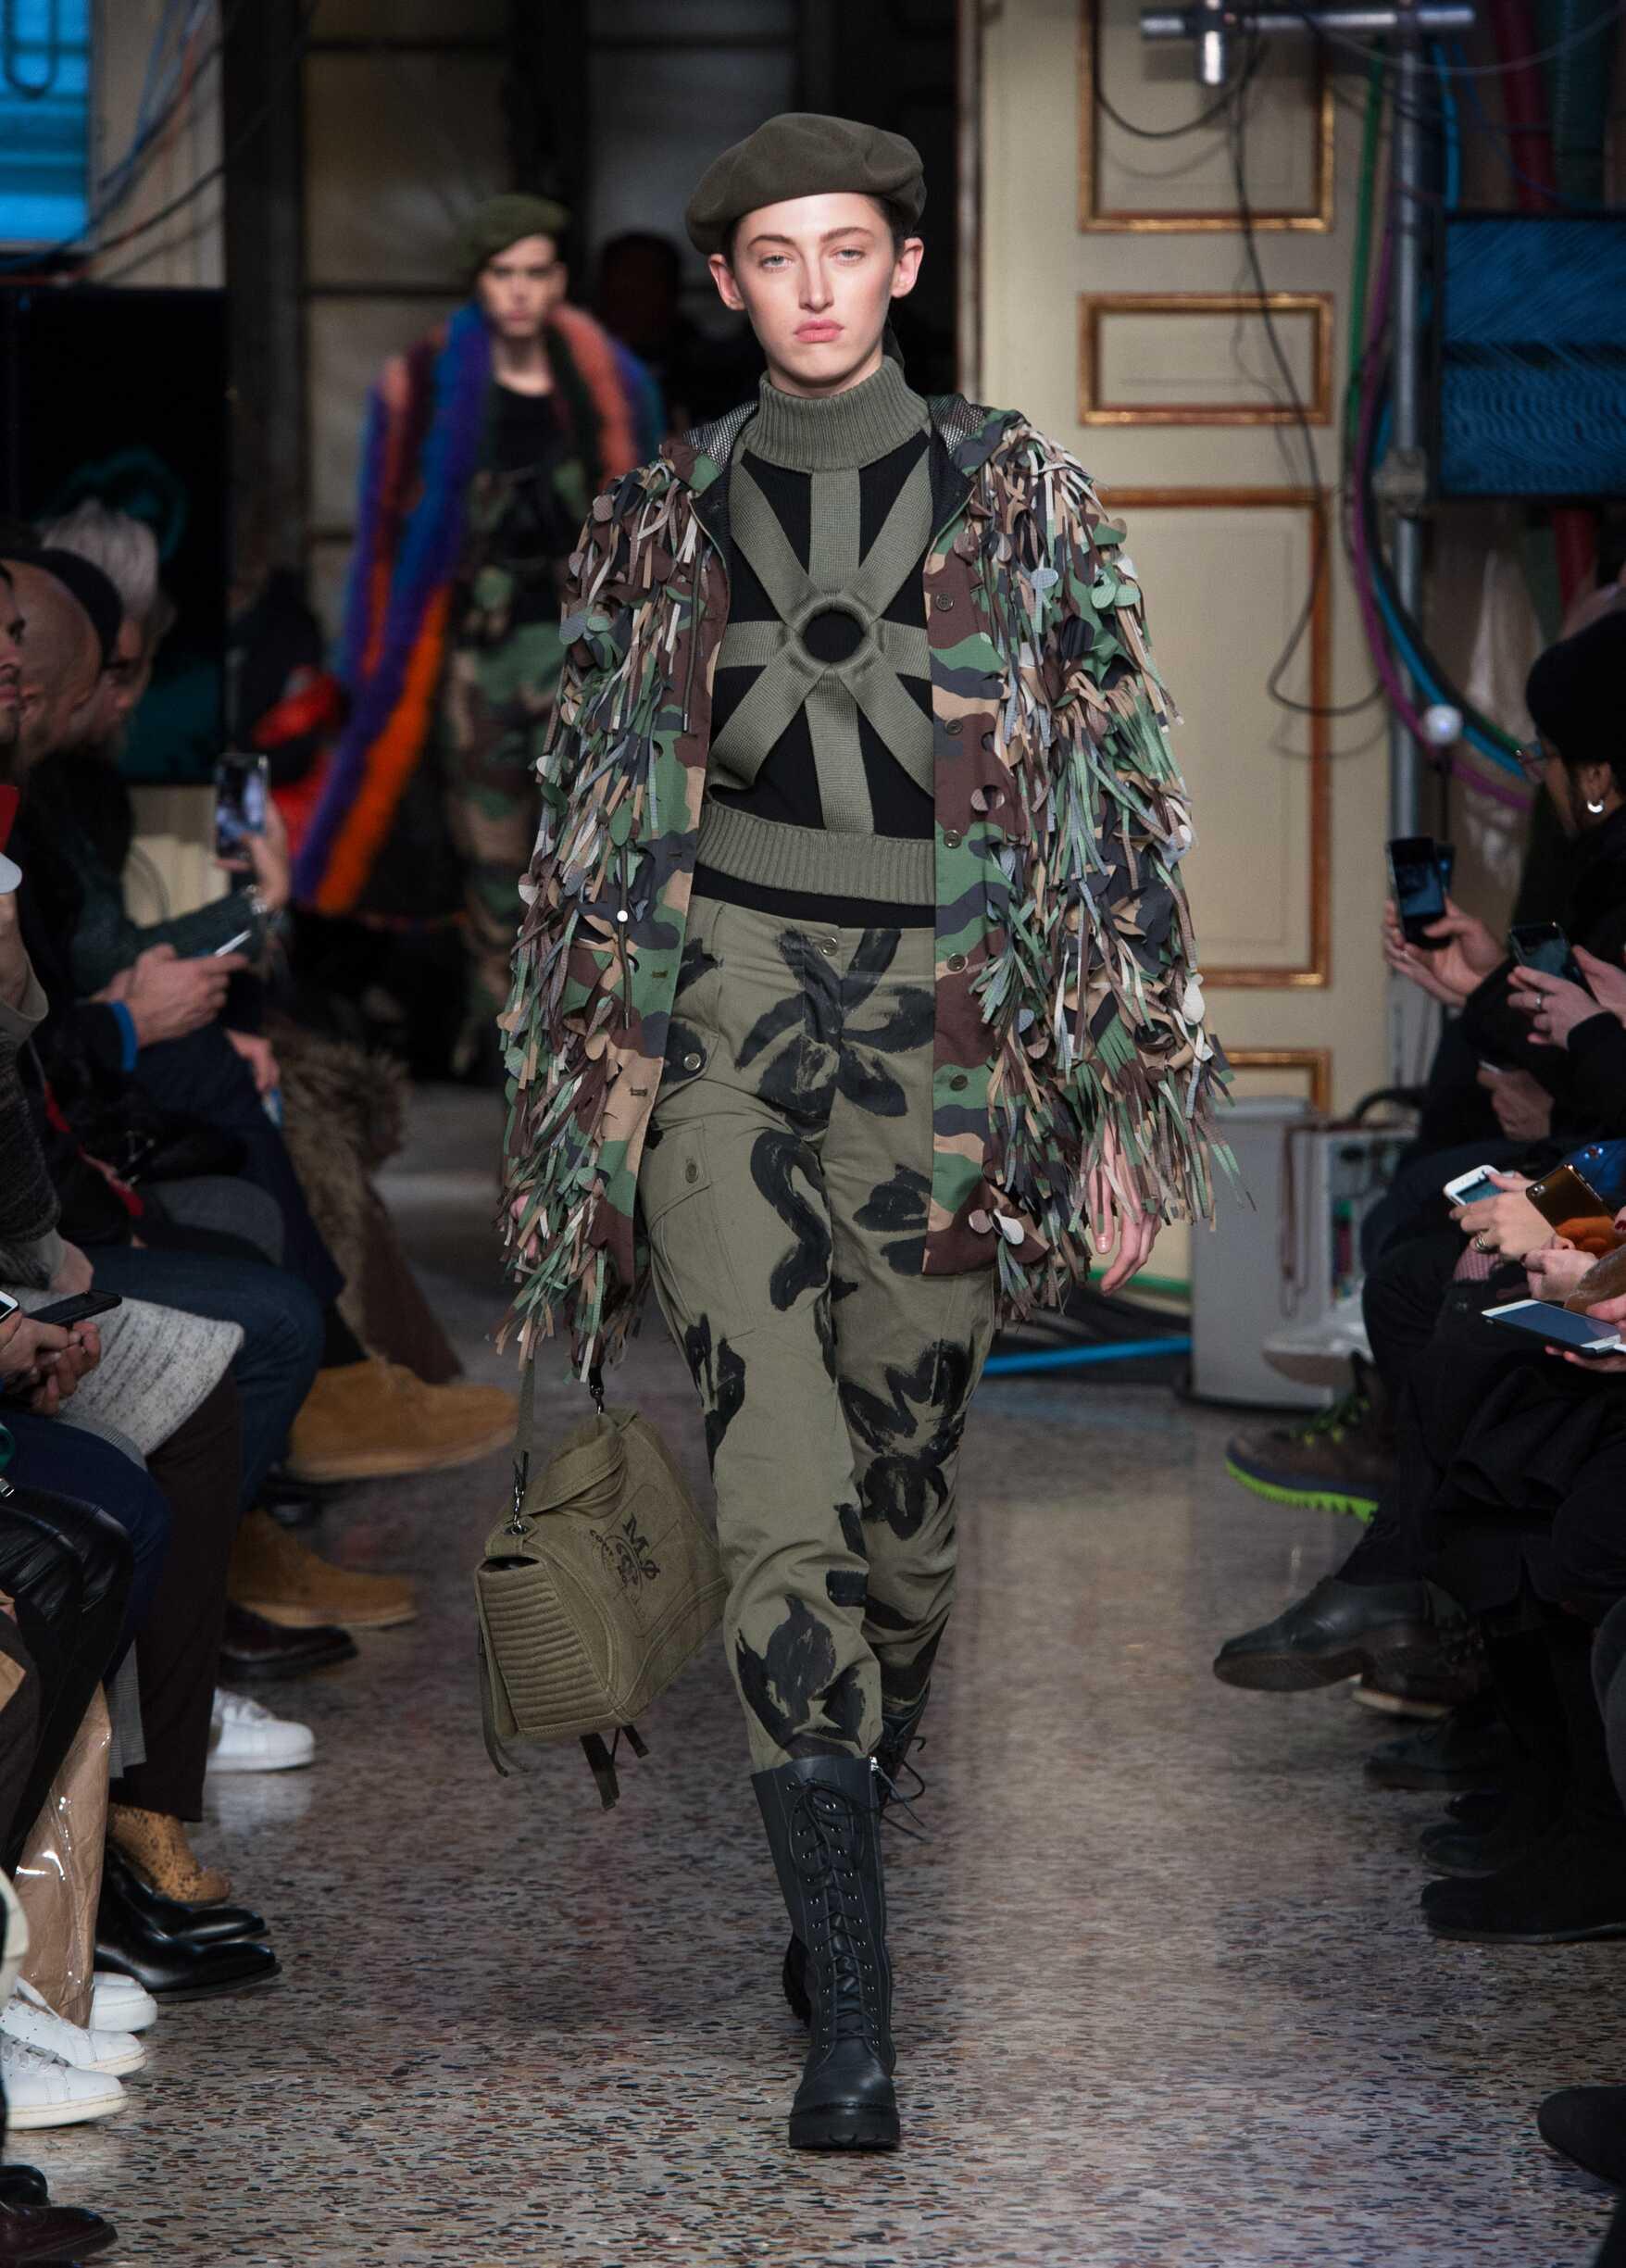 Catwalk Moschino Woman Fashion Show Winter 2017